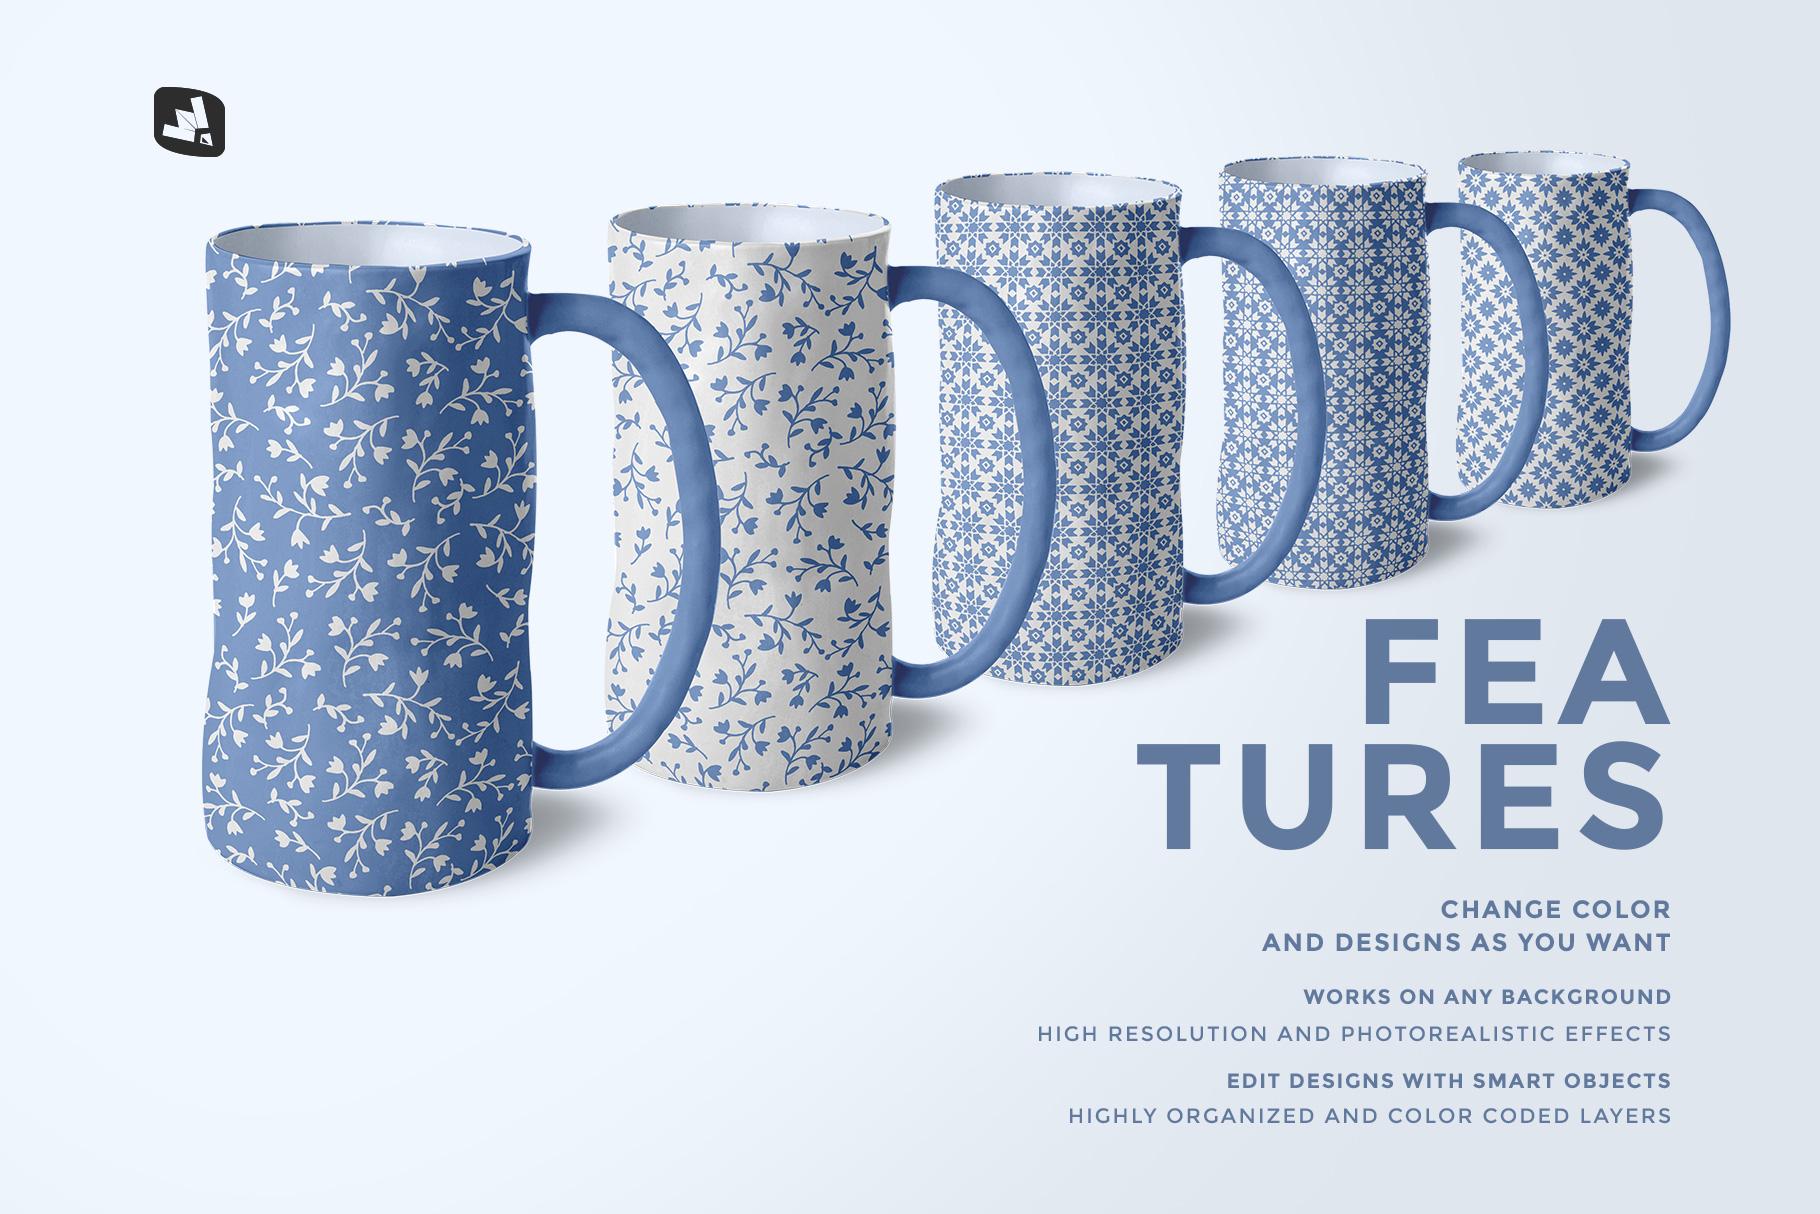 features of the ceramic jug set mockup